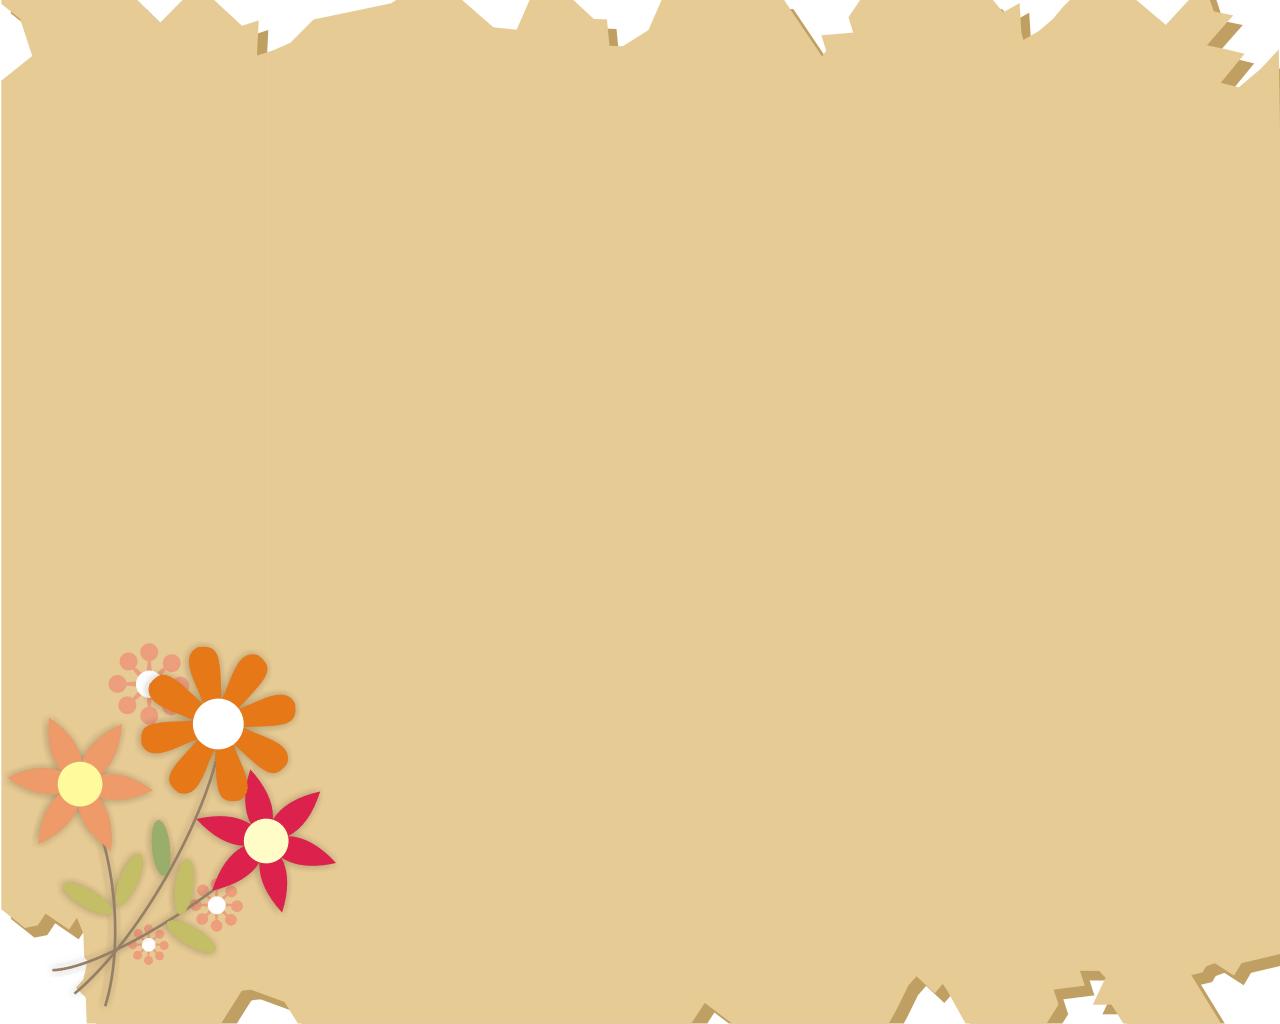 Clip Art Wallpaper Backgrounds Wallpapersafari